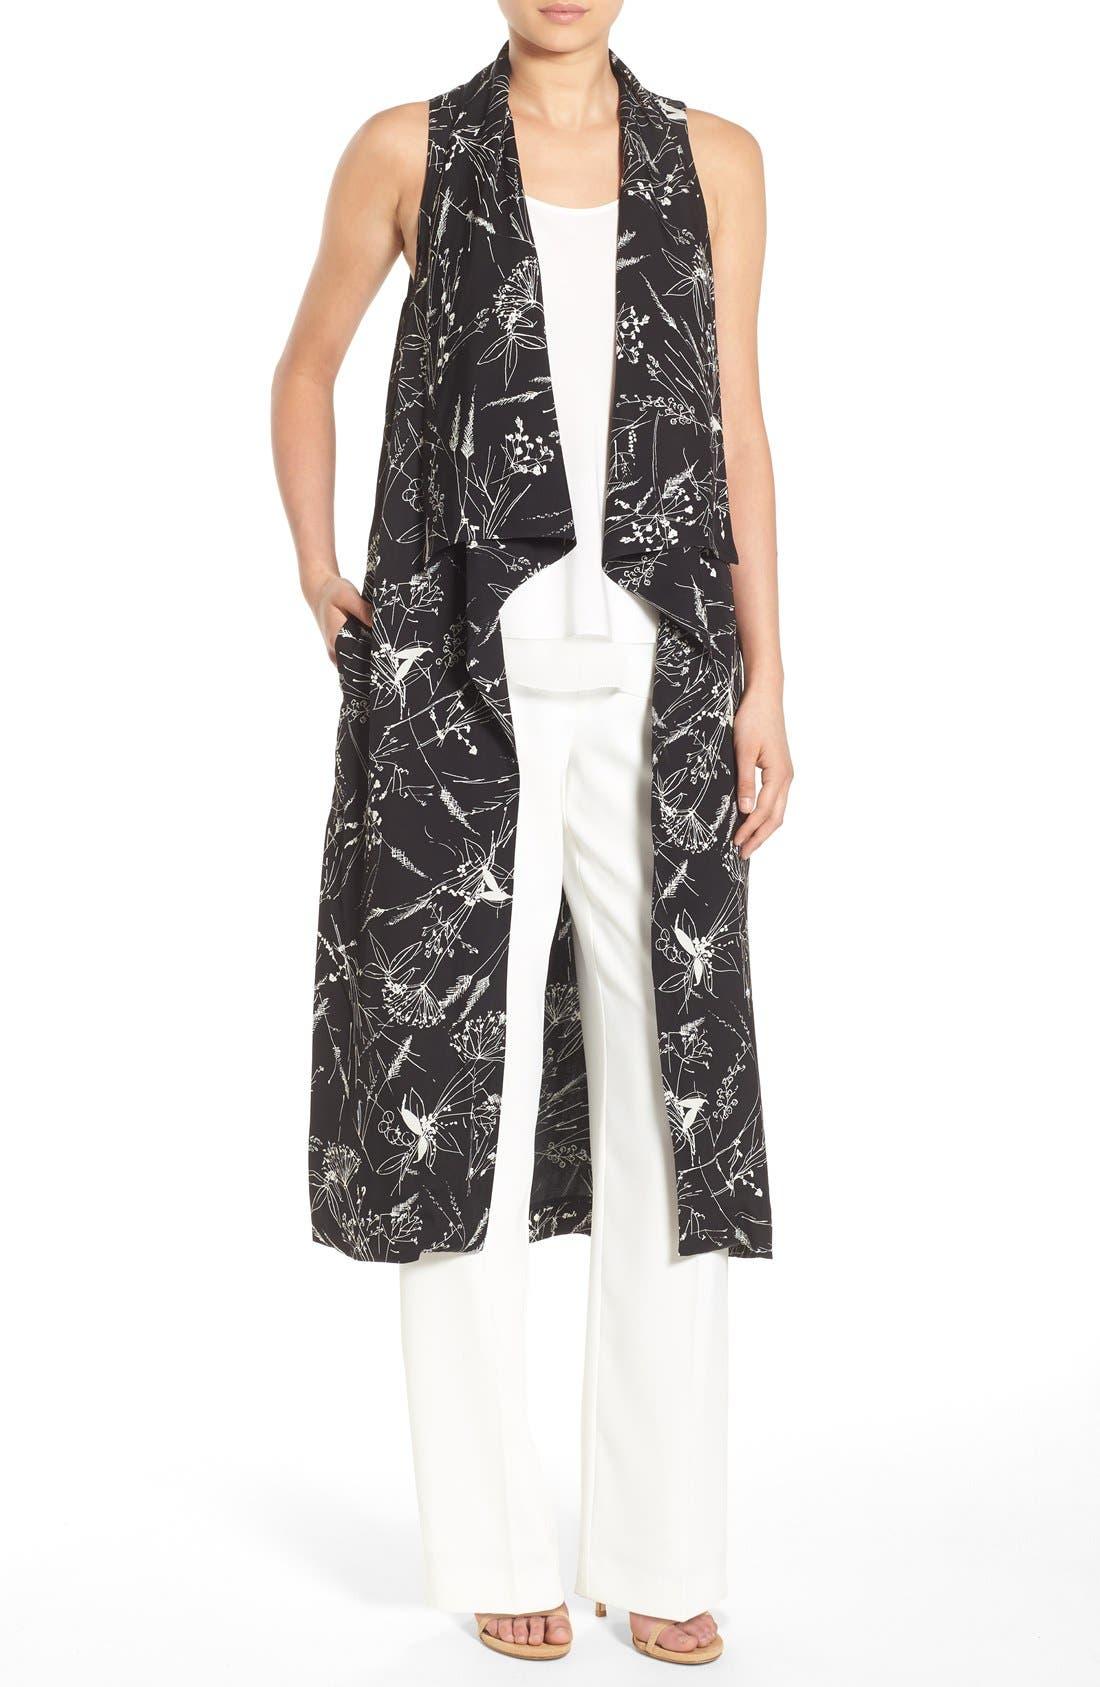 Alternate Image 1 Selected - Olivia Palermo + Chelsea28 Floral Print Long Vest